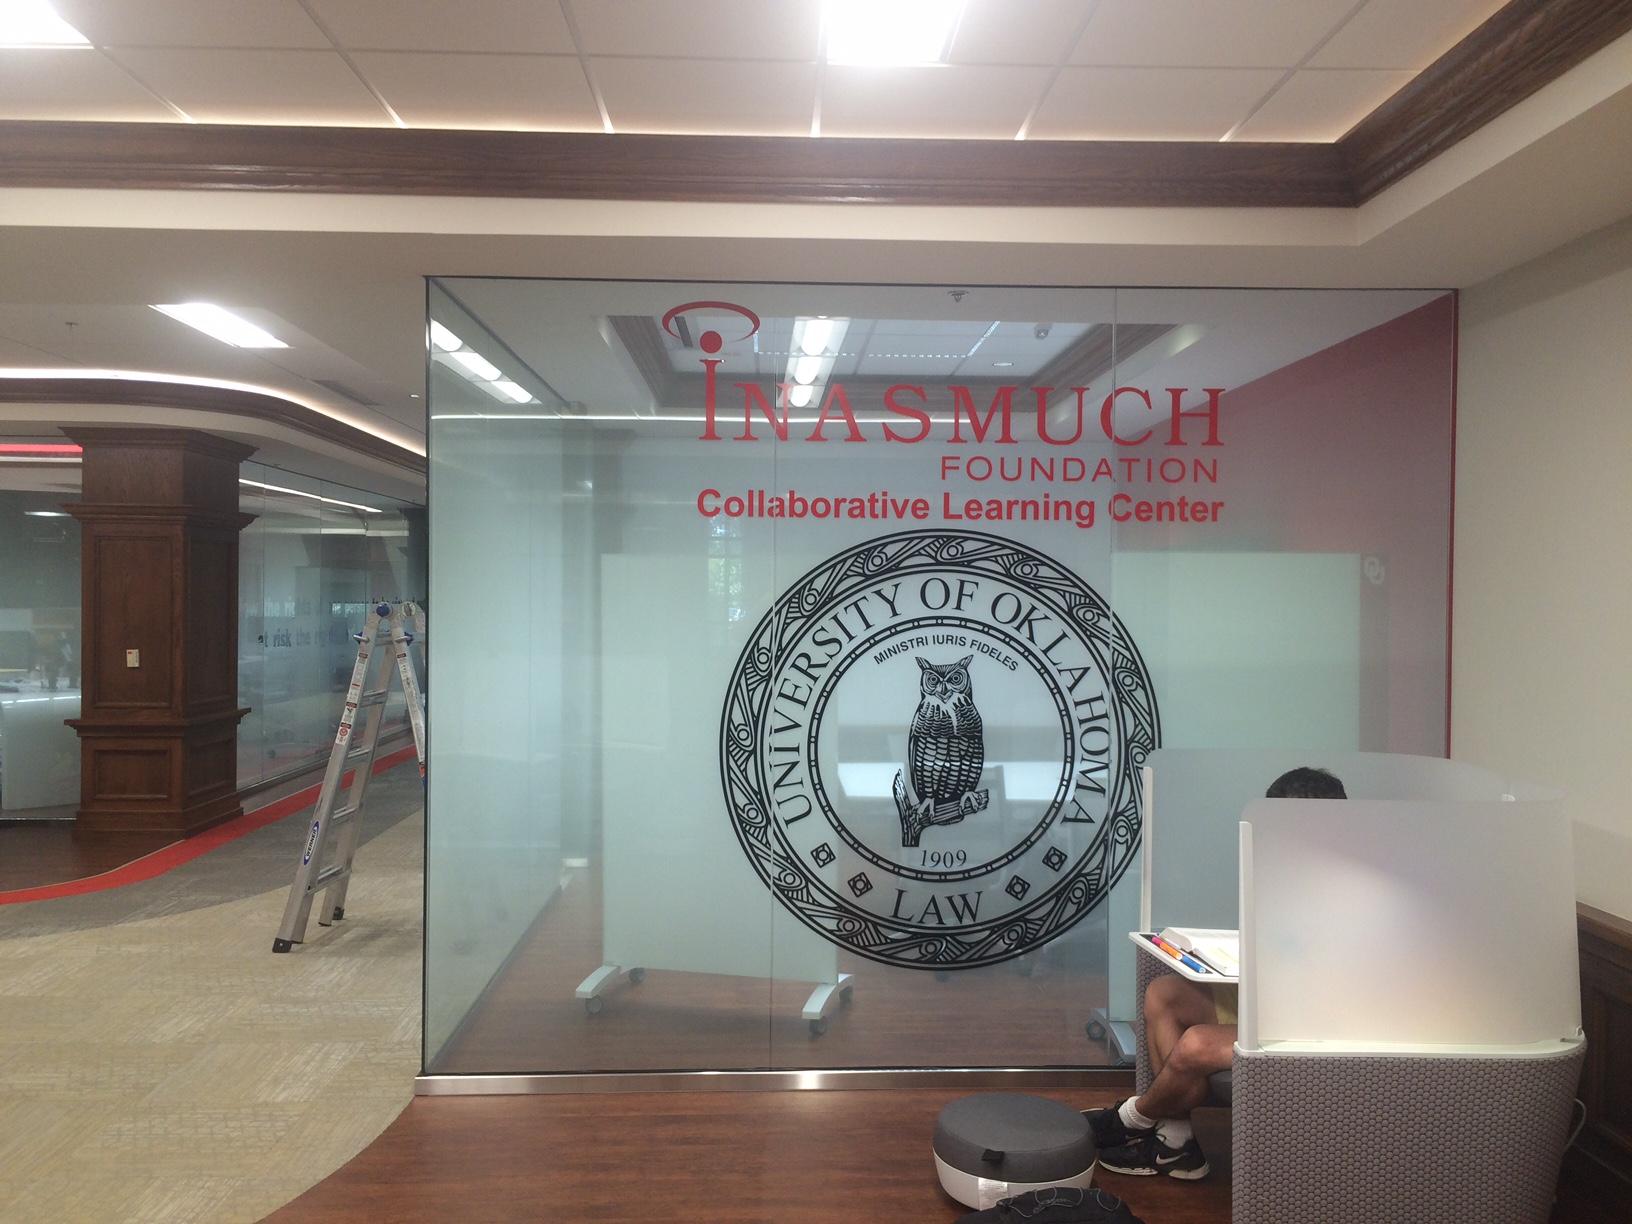 Custom Printed Decorative Film Job for the University of Oklahoma